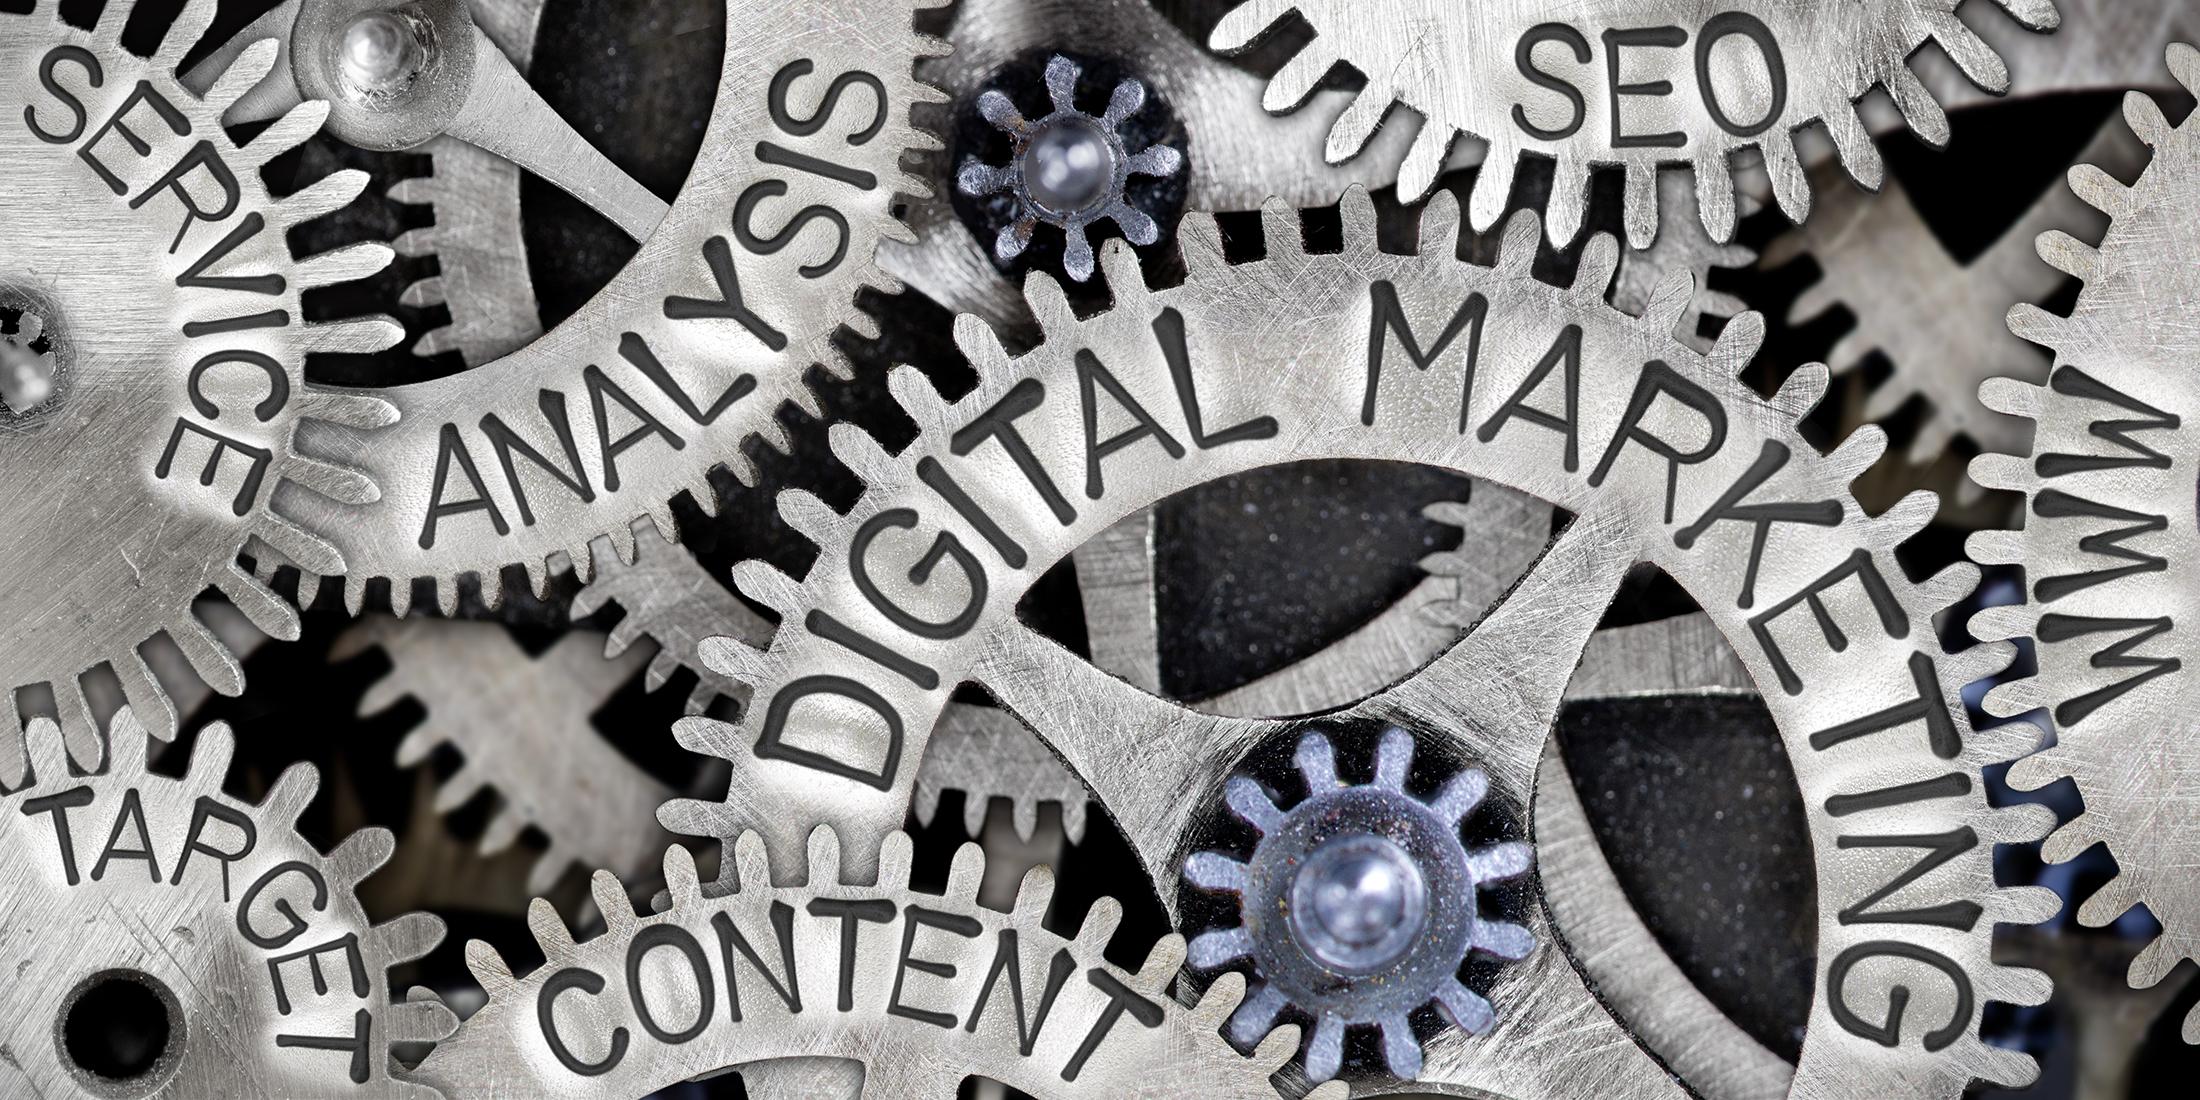 Internet Marketing cogs, Mike Slatton